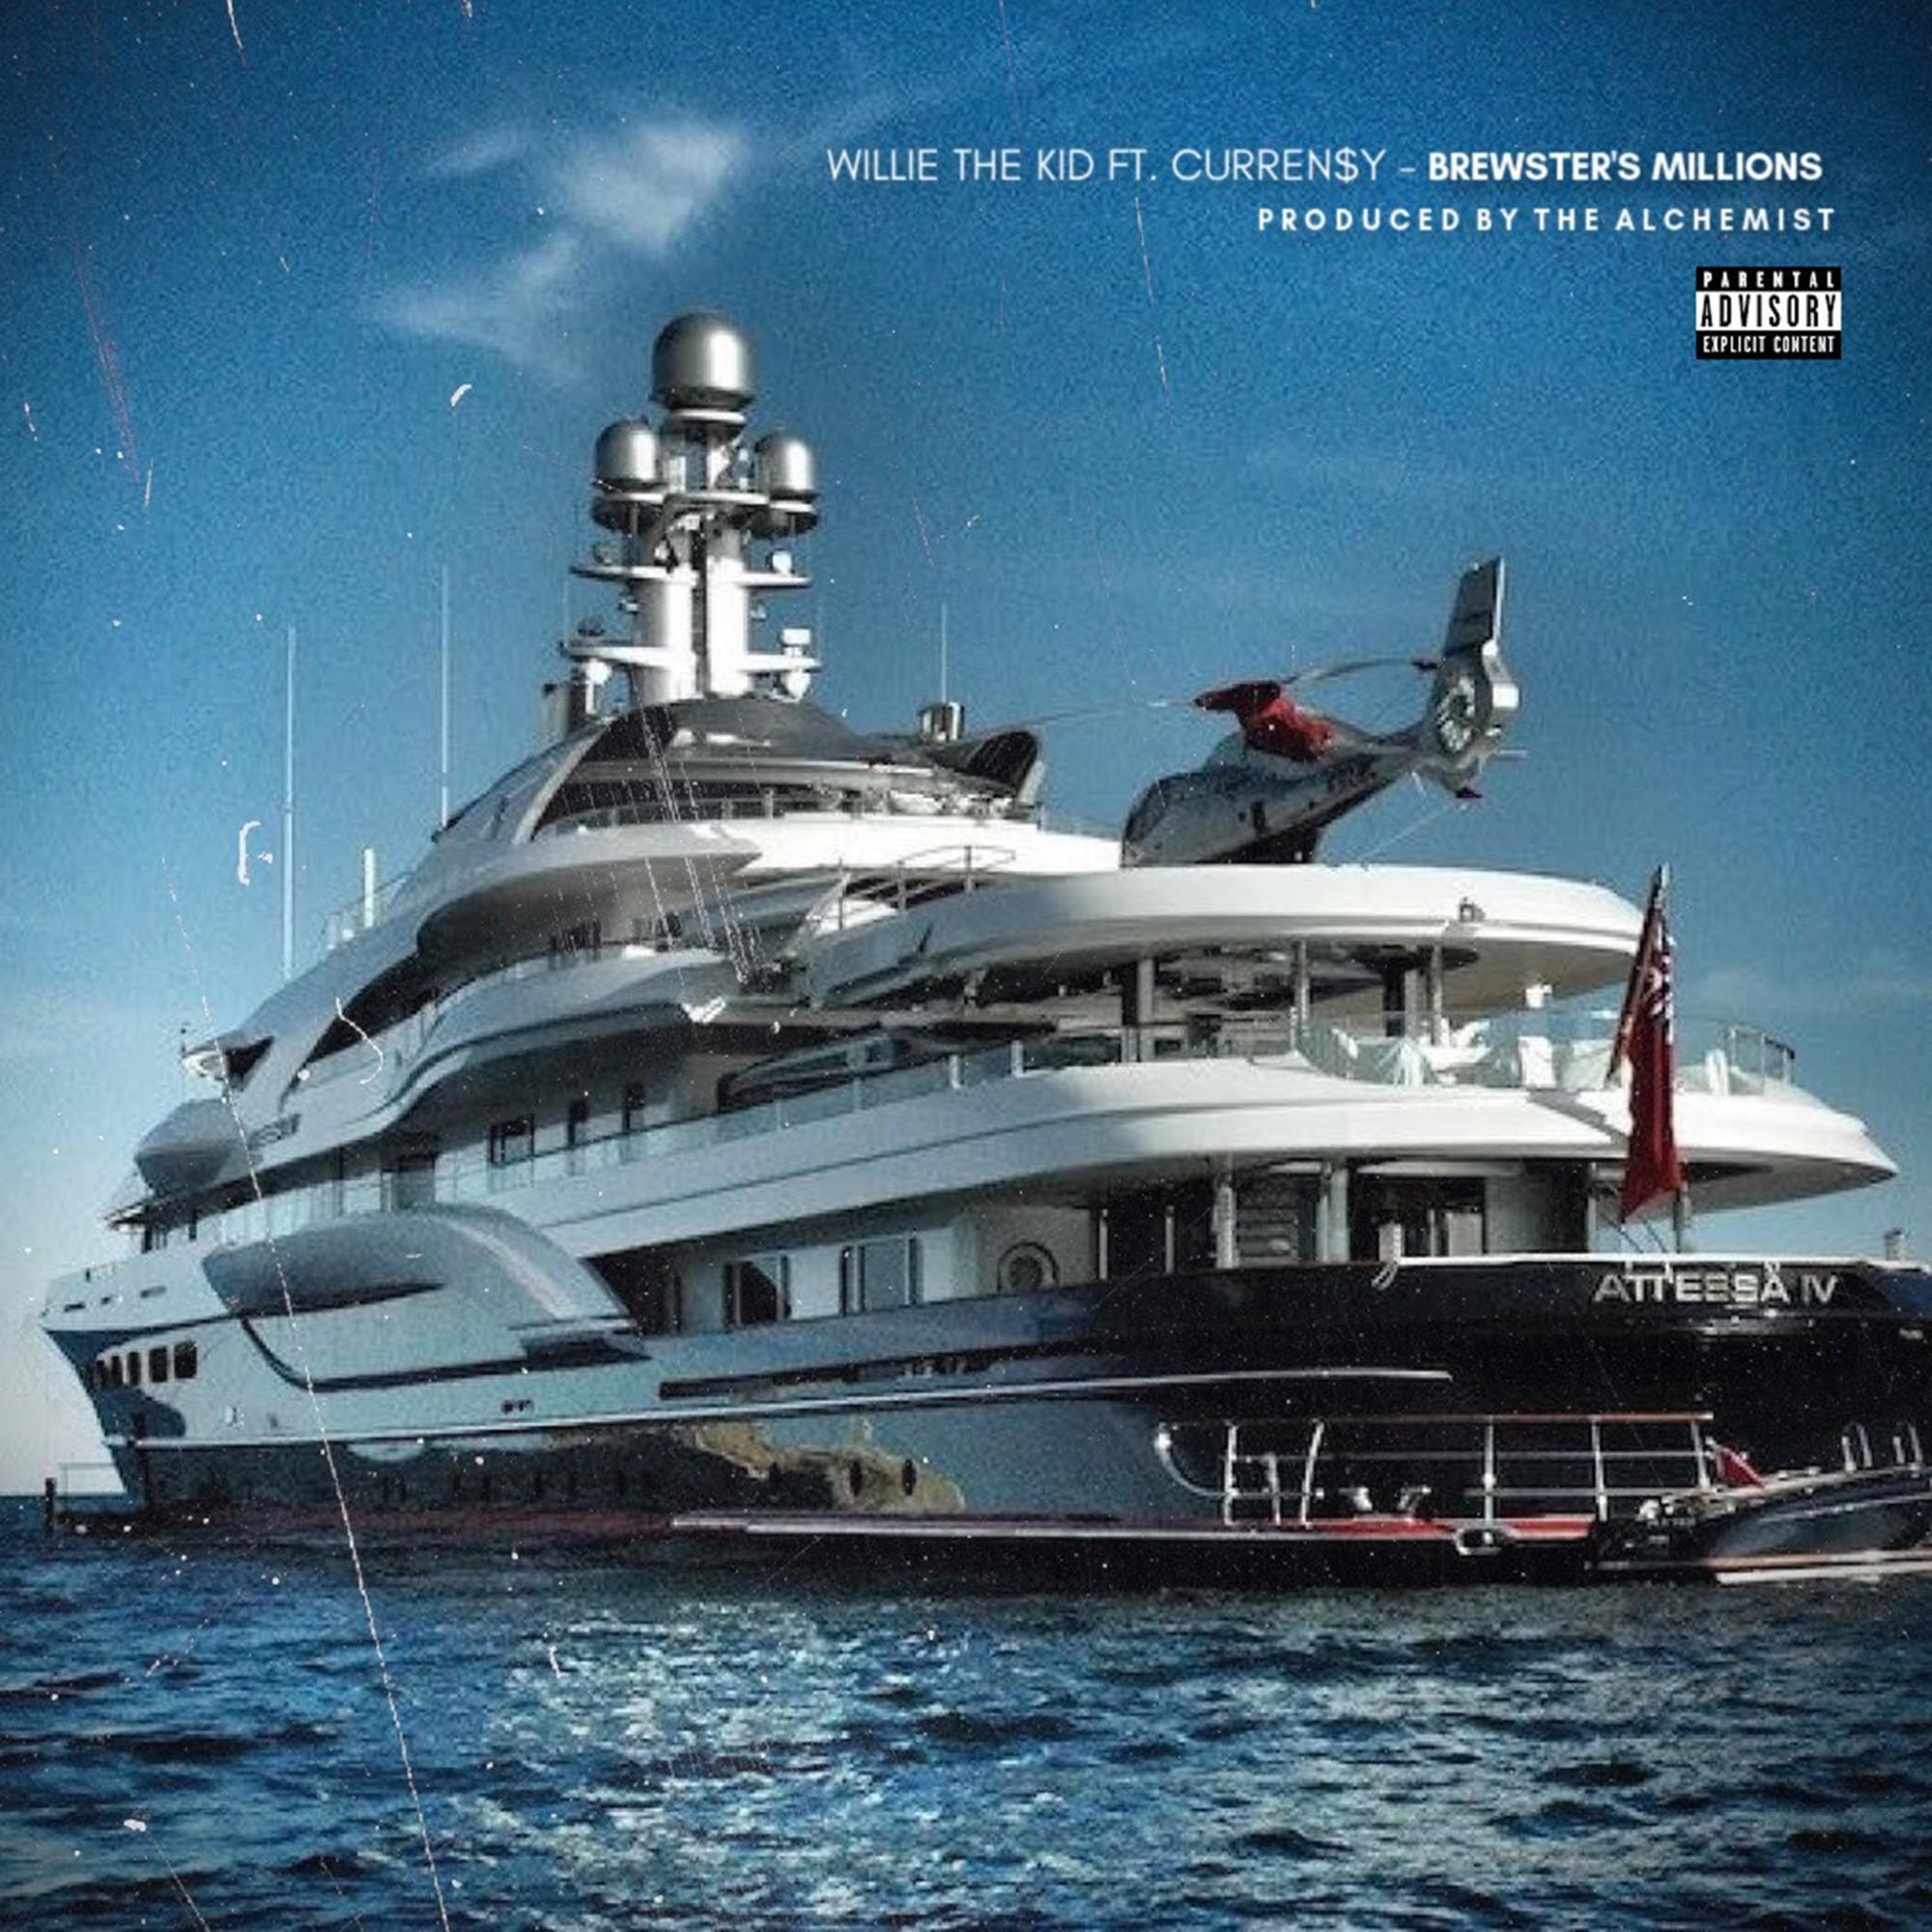 Willie the Kid feat. Curren$y - Brewster's Millions